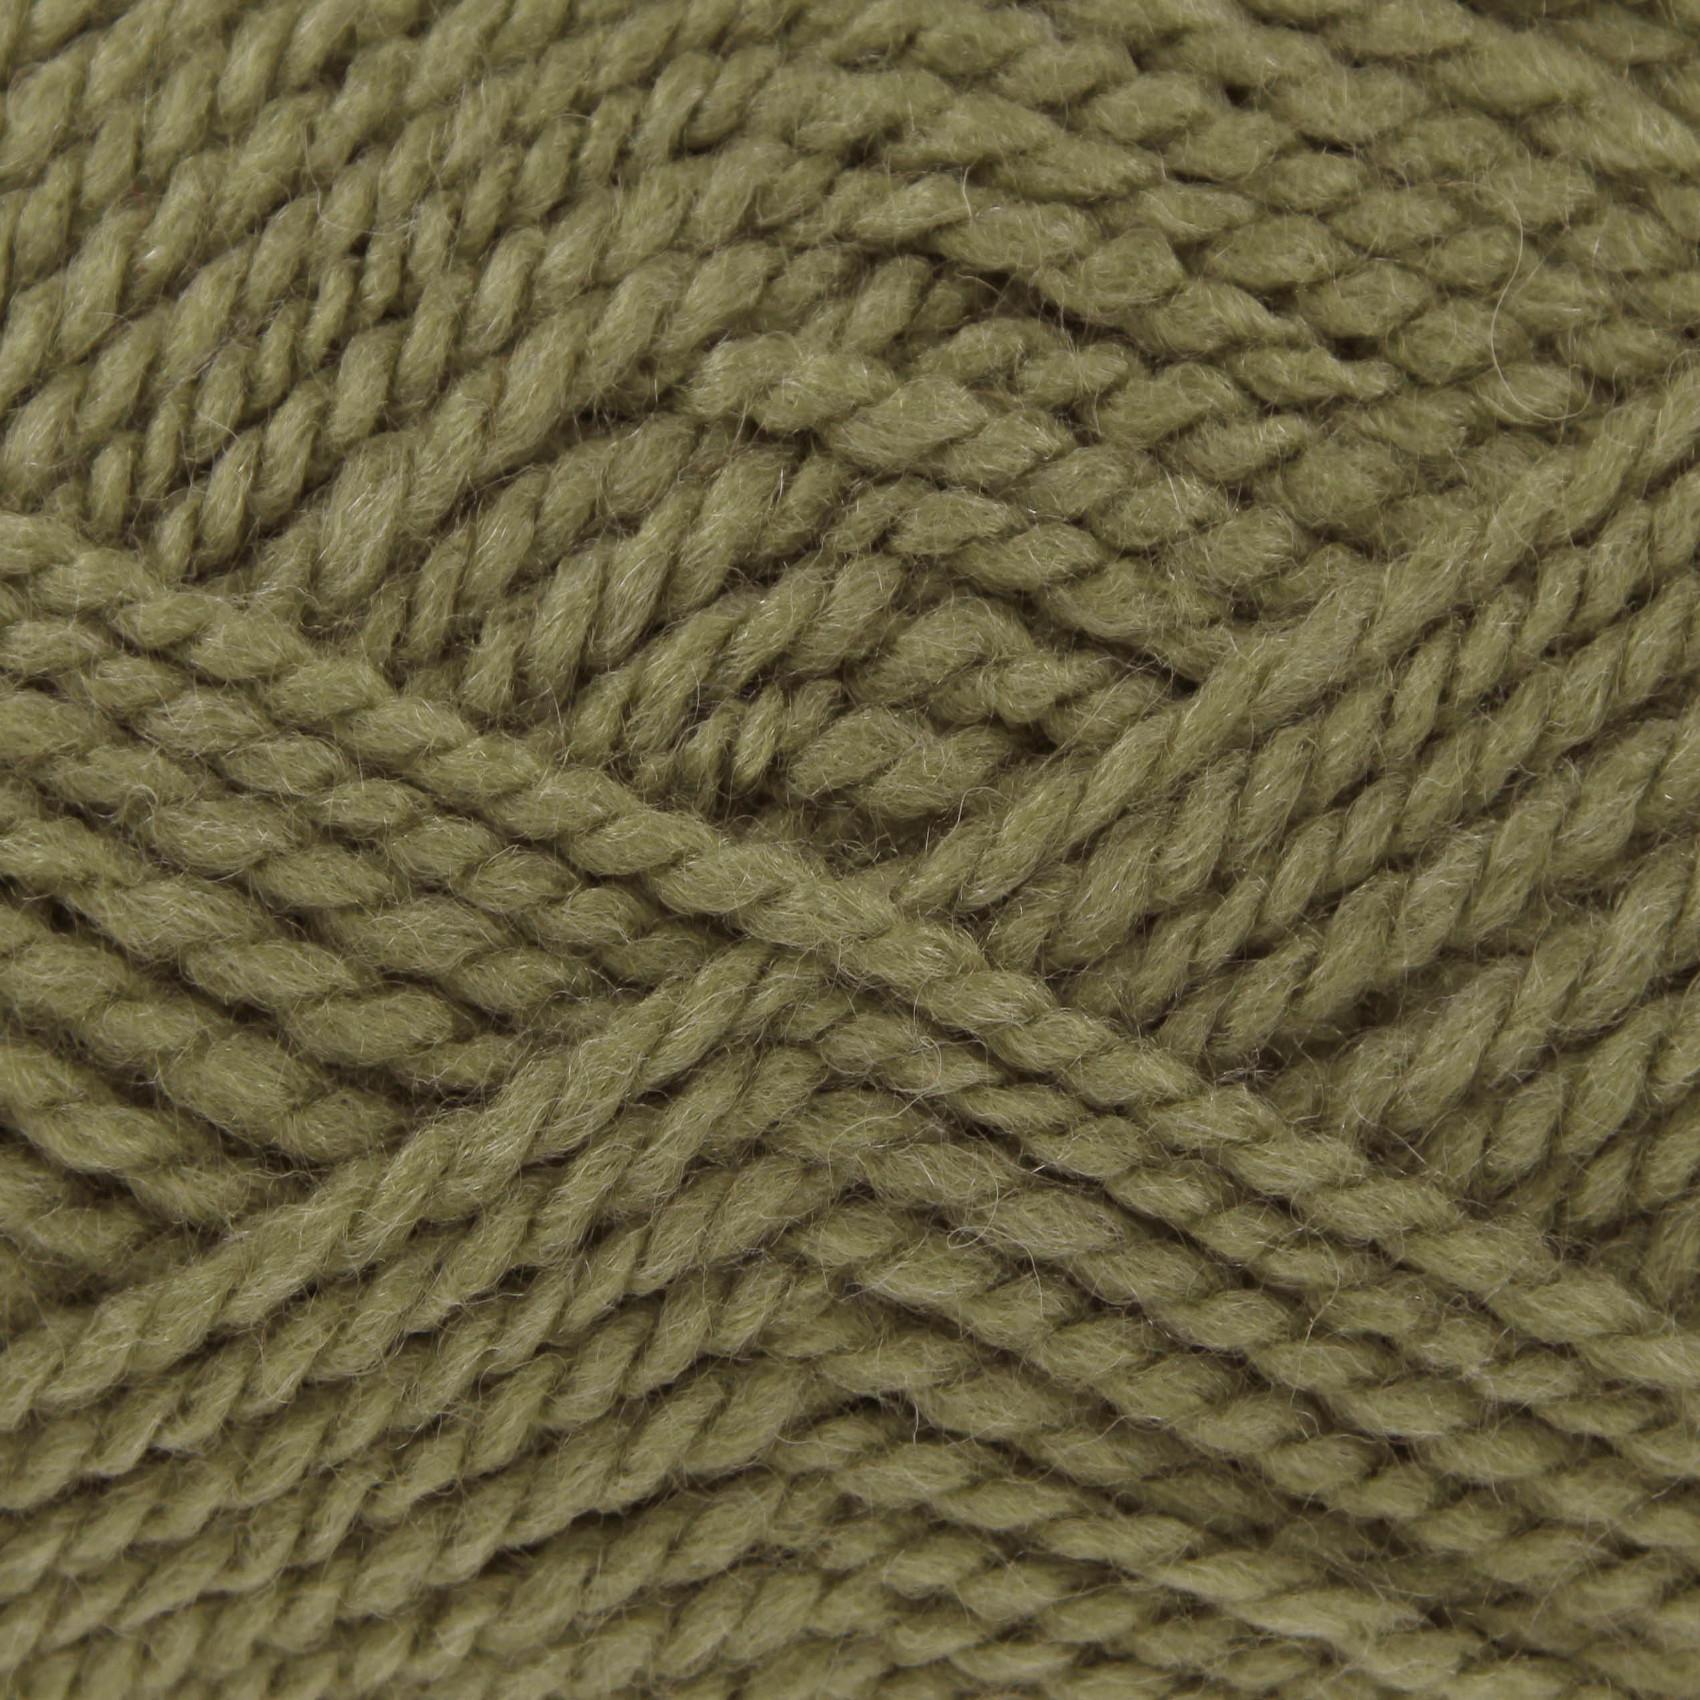 Knitting Yarn Wool : king-cole-magnum-chunky-knitting-yarn-wool-khaki-1445.jpg